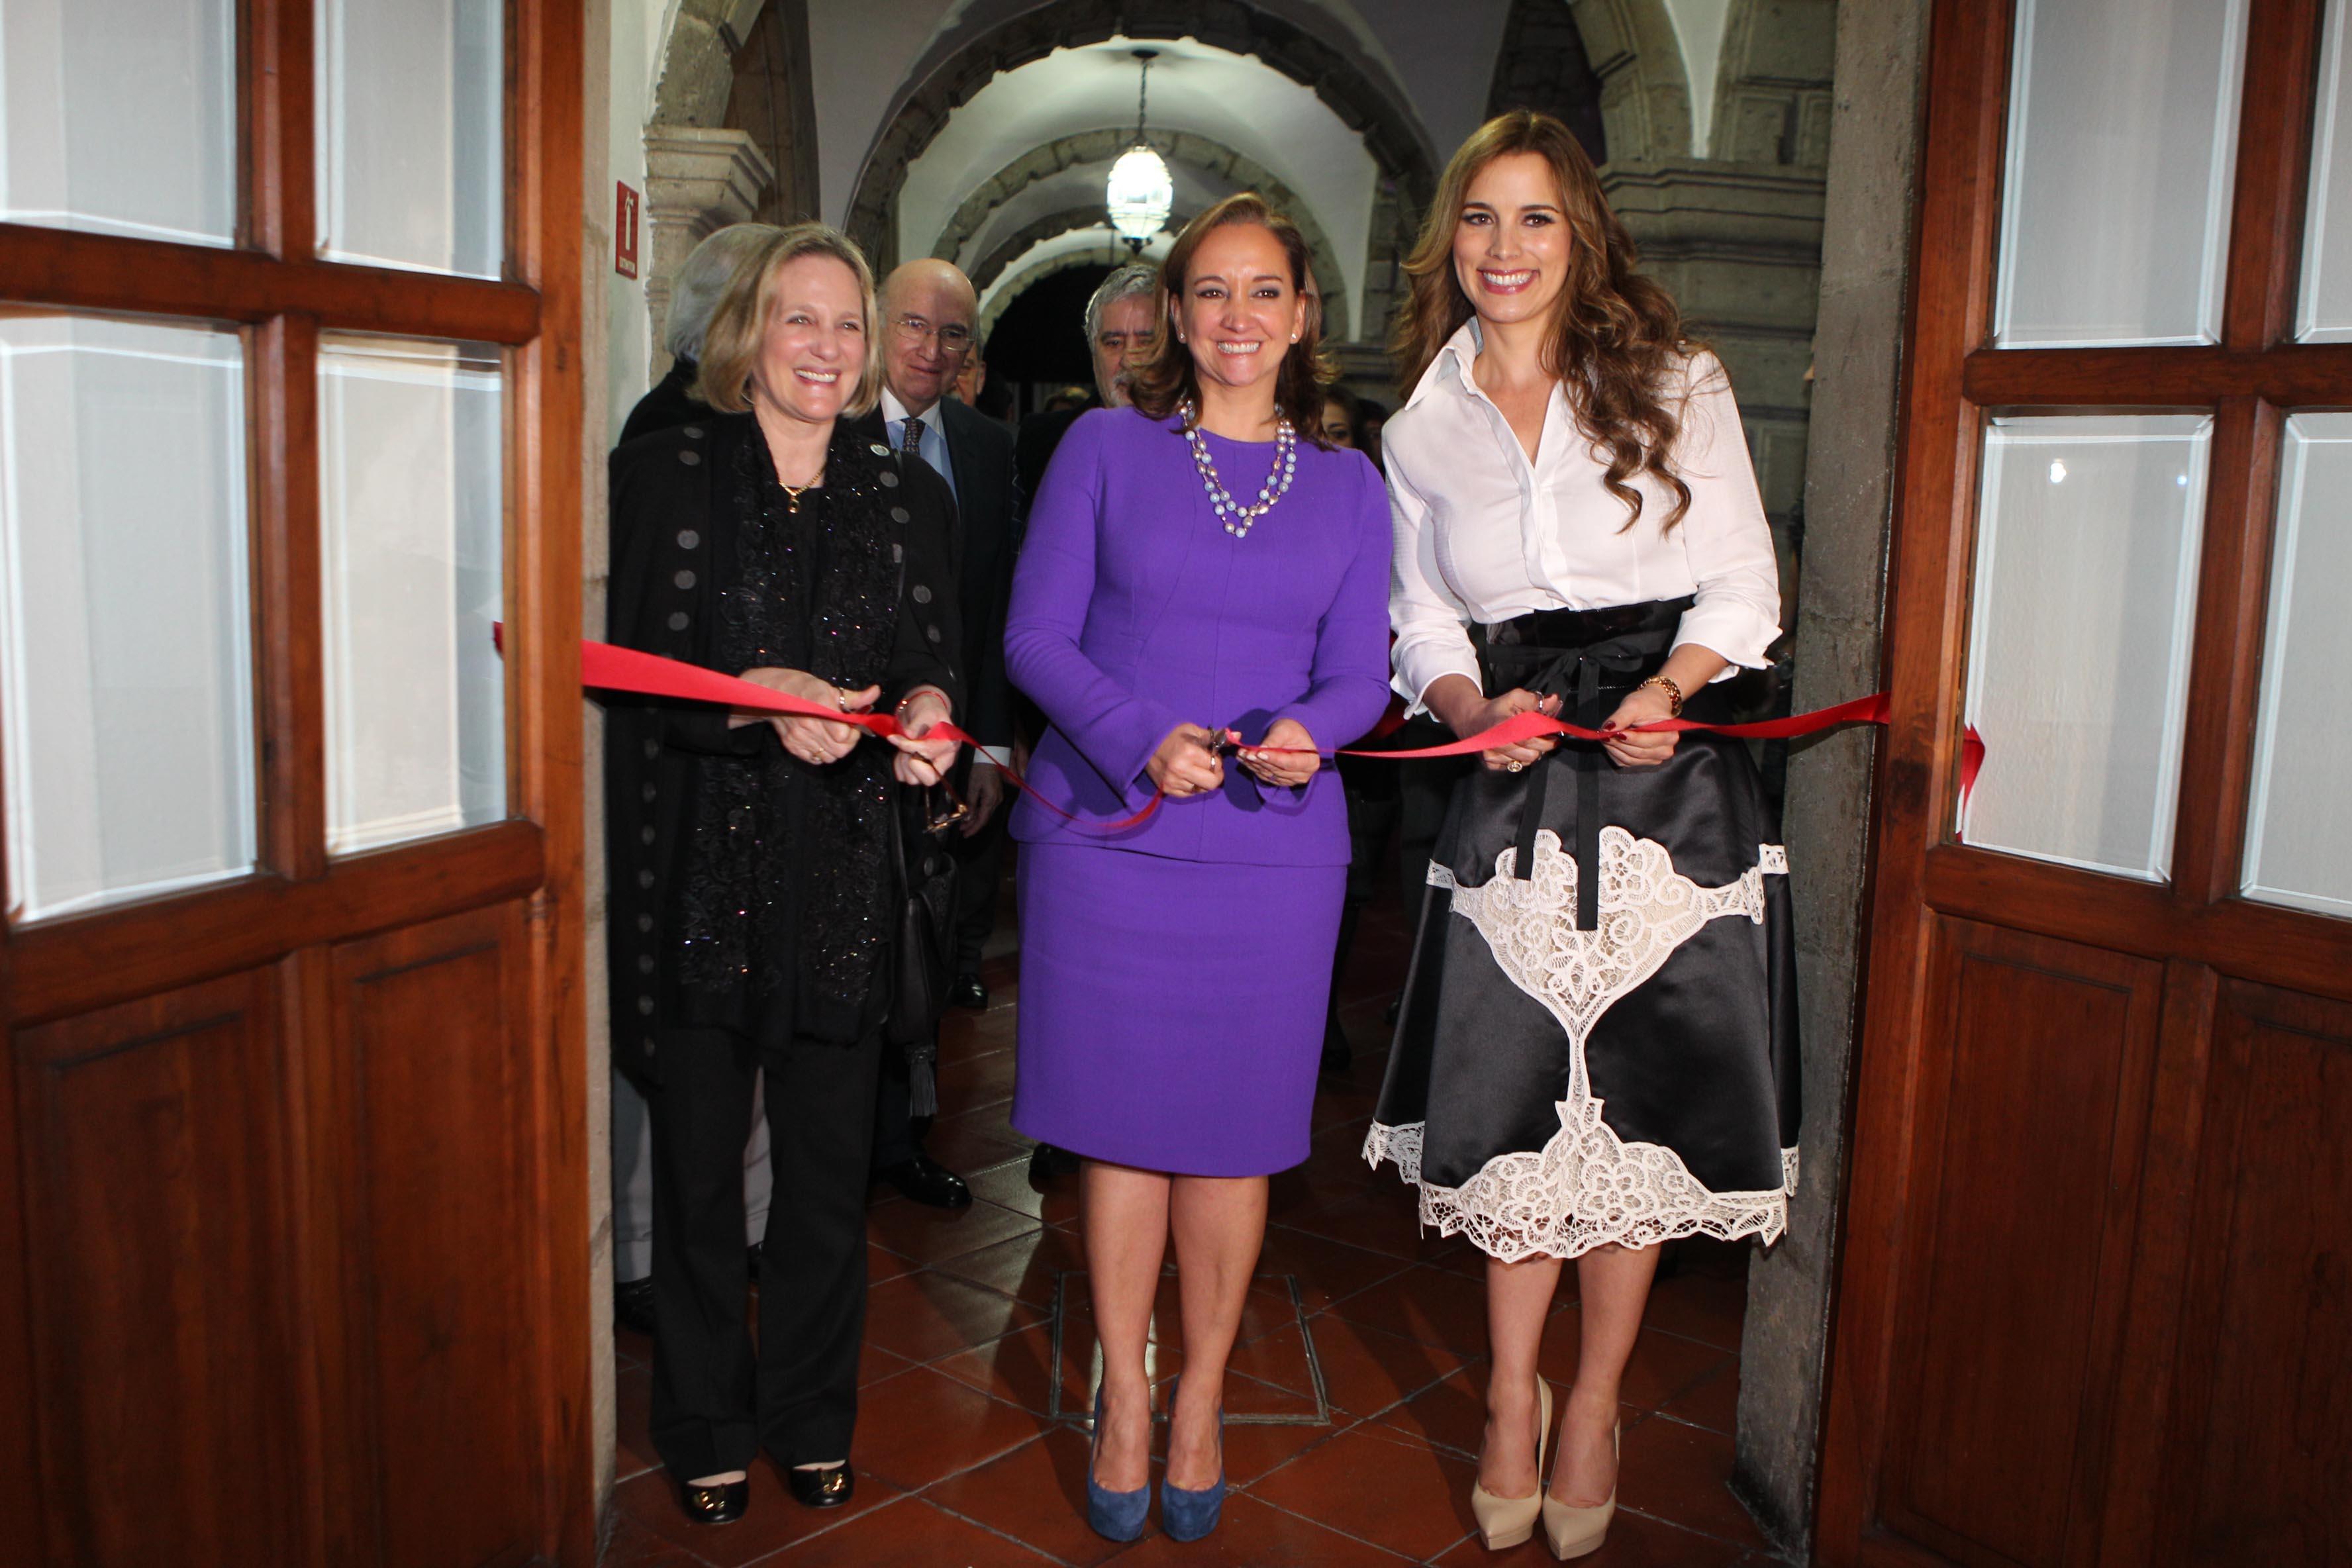 FOTO 1 La Canciller Claudia Ruiz Massieu inaugura exposici n de artistas peruanos.jpg